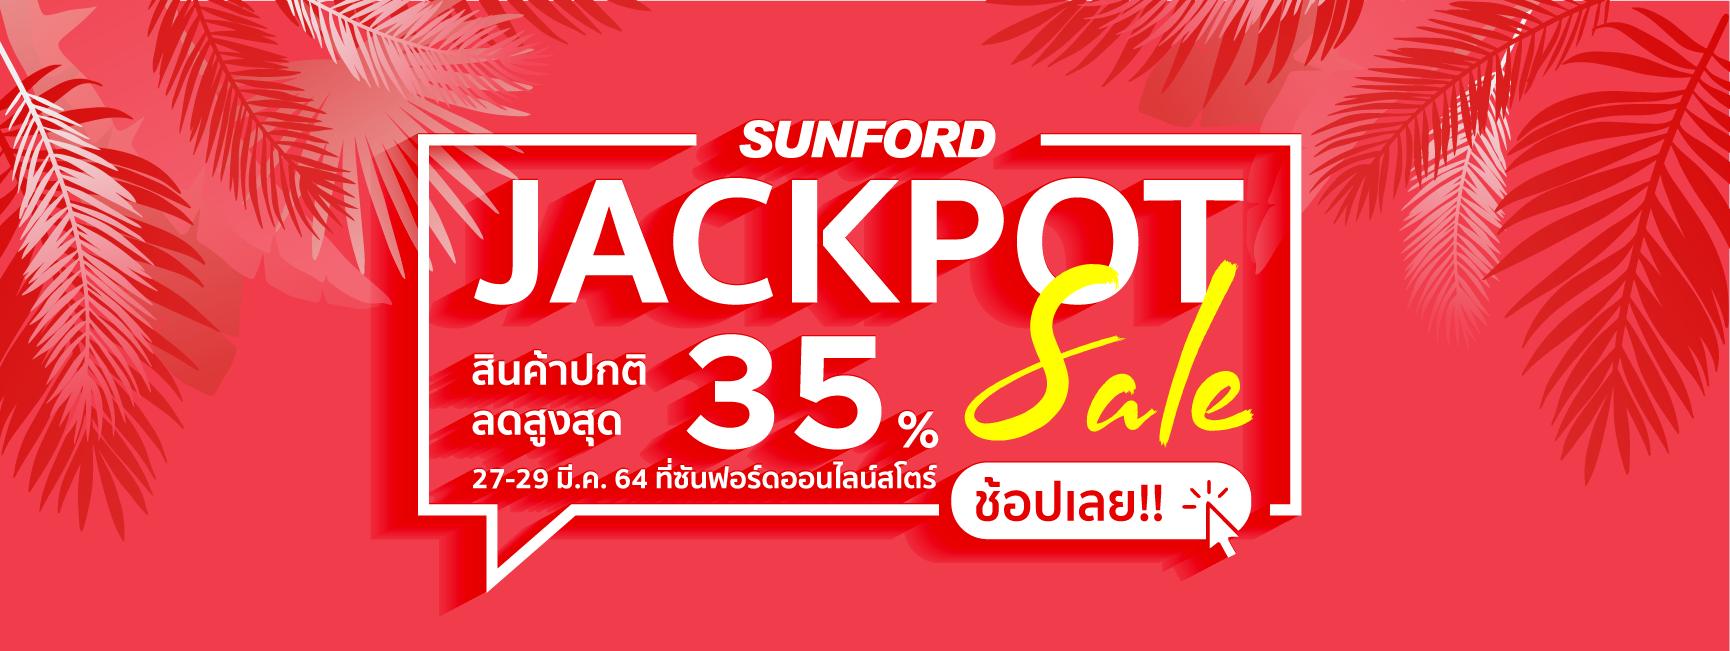 SUNFORD JACKPOT SALE สูงสุด 35%